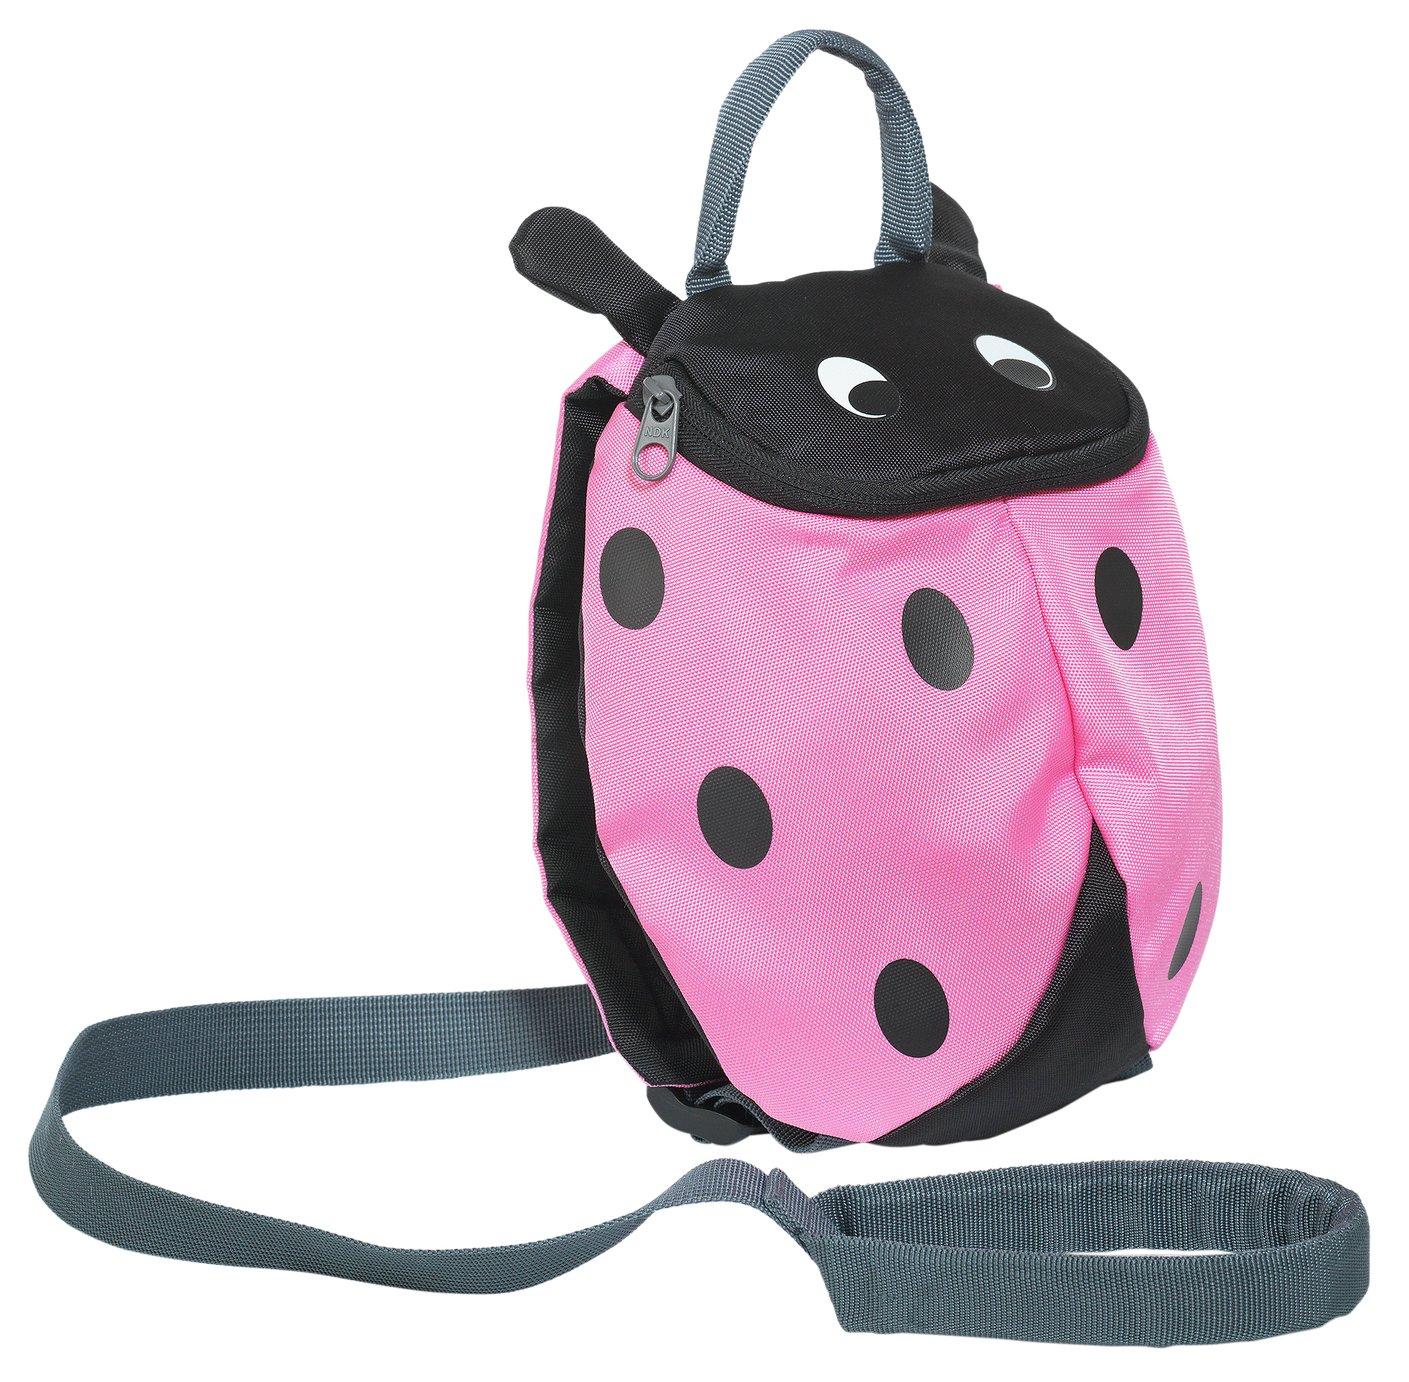 Image of Trespass - Ladybird Reins Backpack - Pink